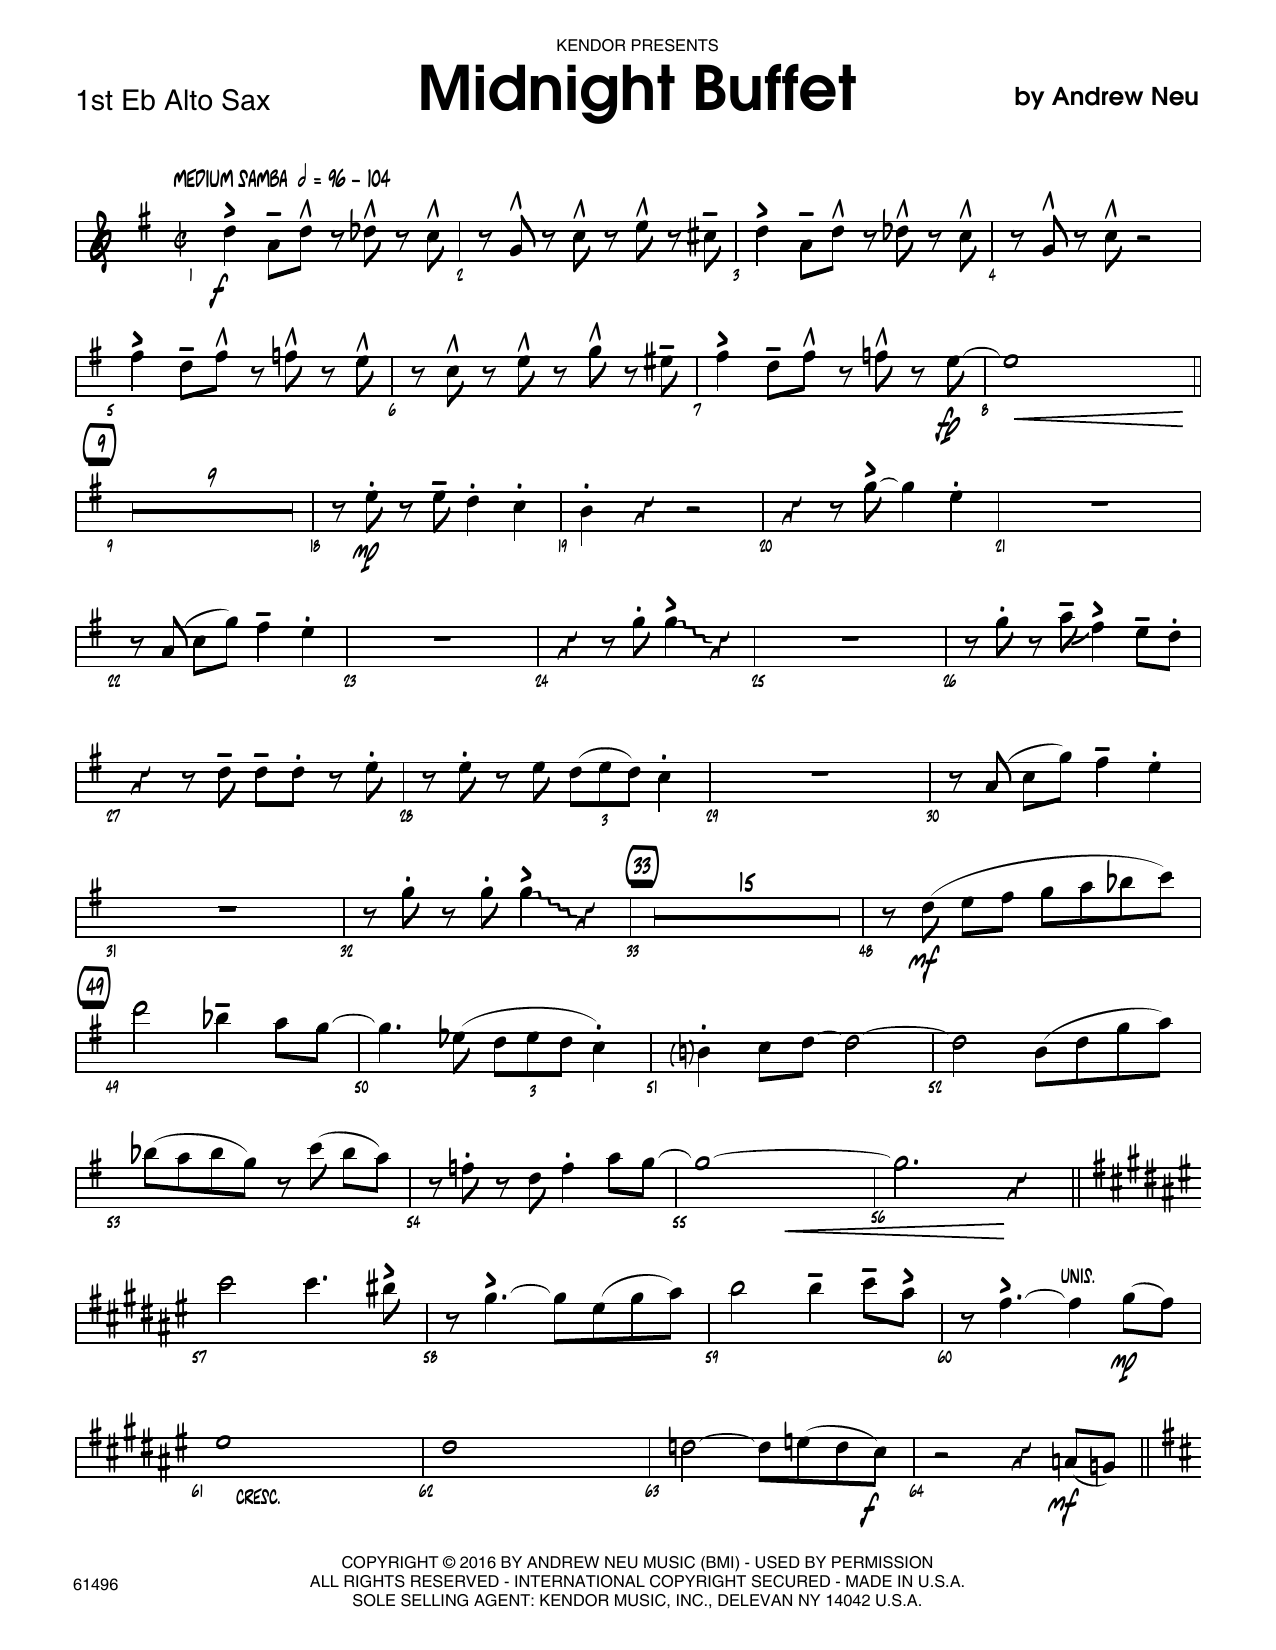 Midnight Buffet - 1st Eb Alto Saxophone Sheet Music